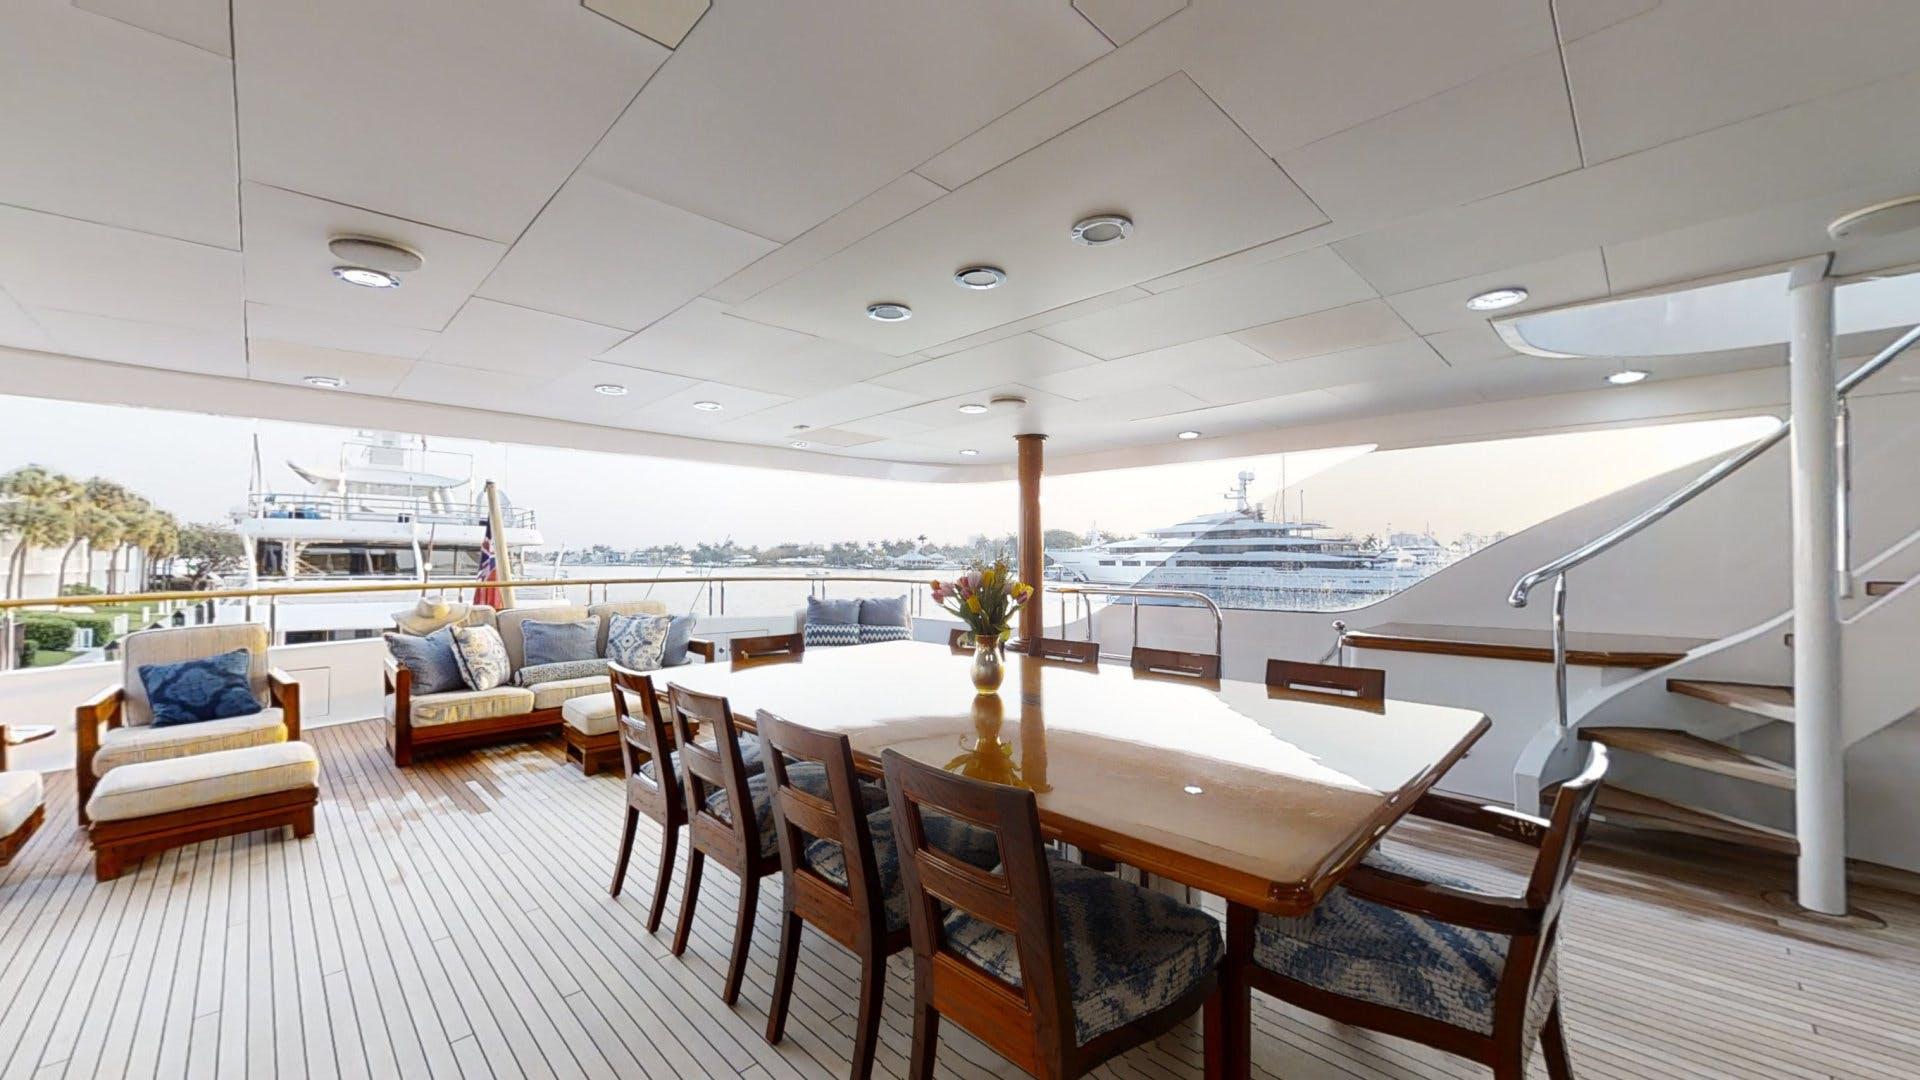 2010 Trinity Yachts 164' Tri-Deck Motor Yacht ASPEN ALTERNATIVE | Picture 6 of 30